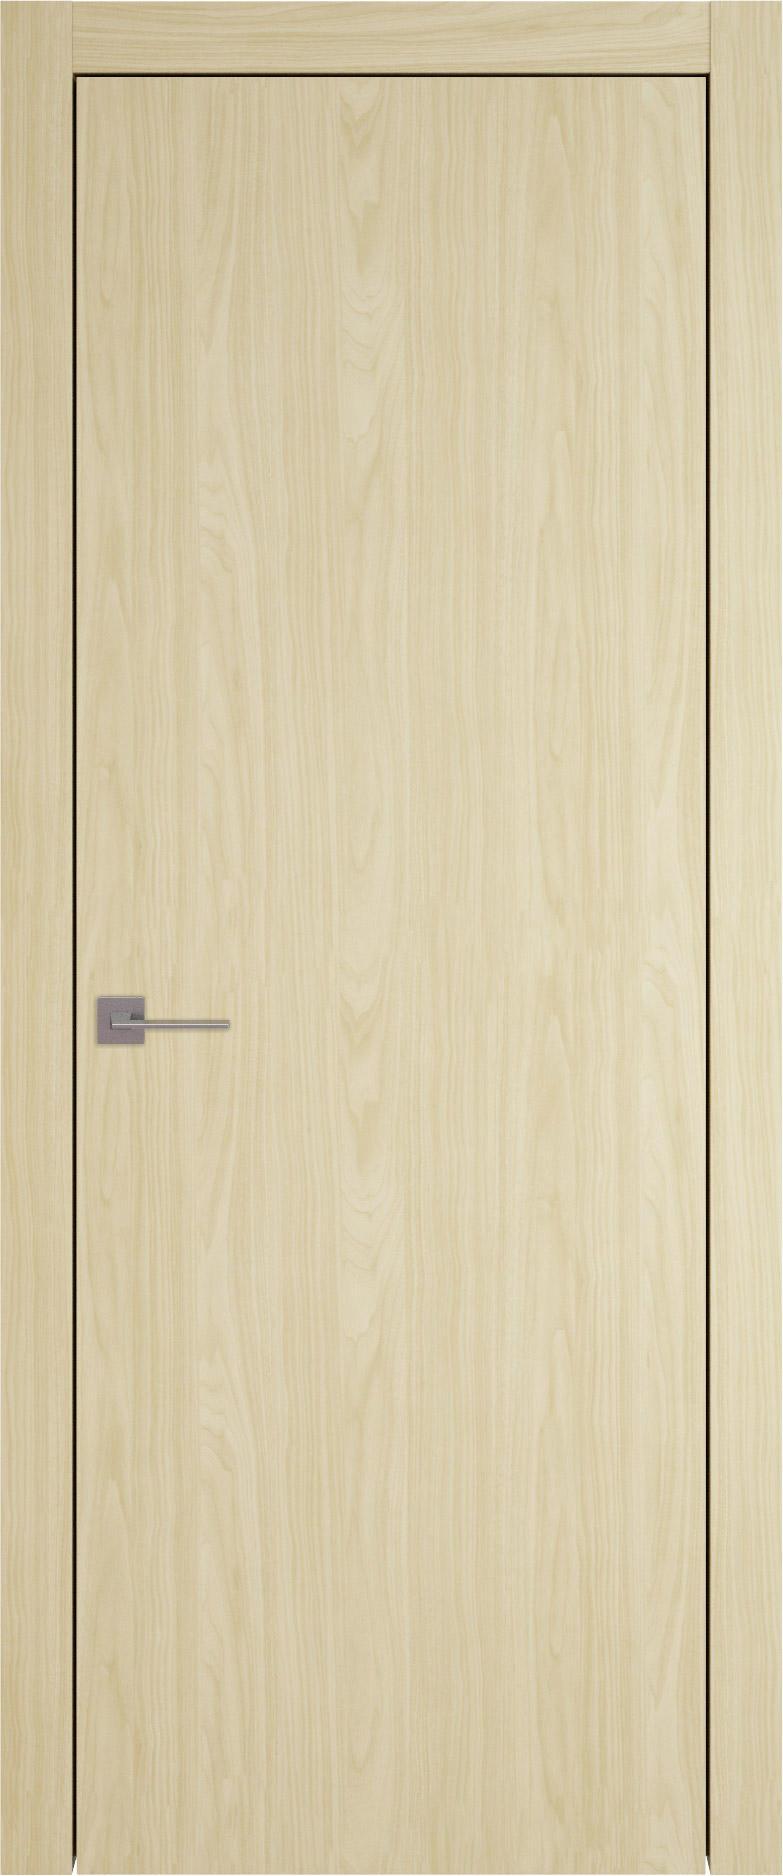 Tivoli А-1 цвет - Дуб нордик Без стекла (ДГ)